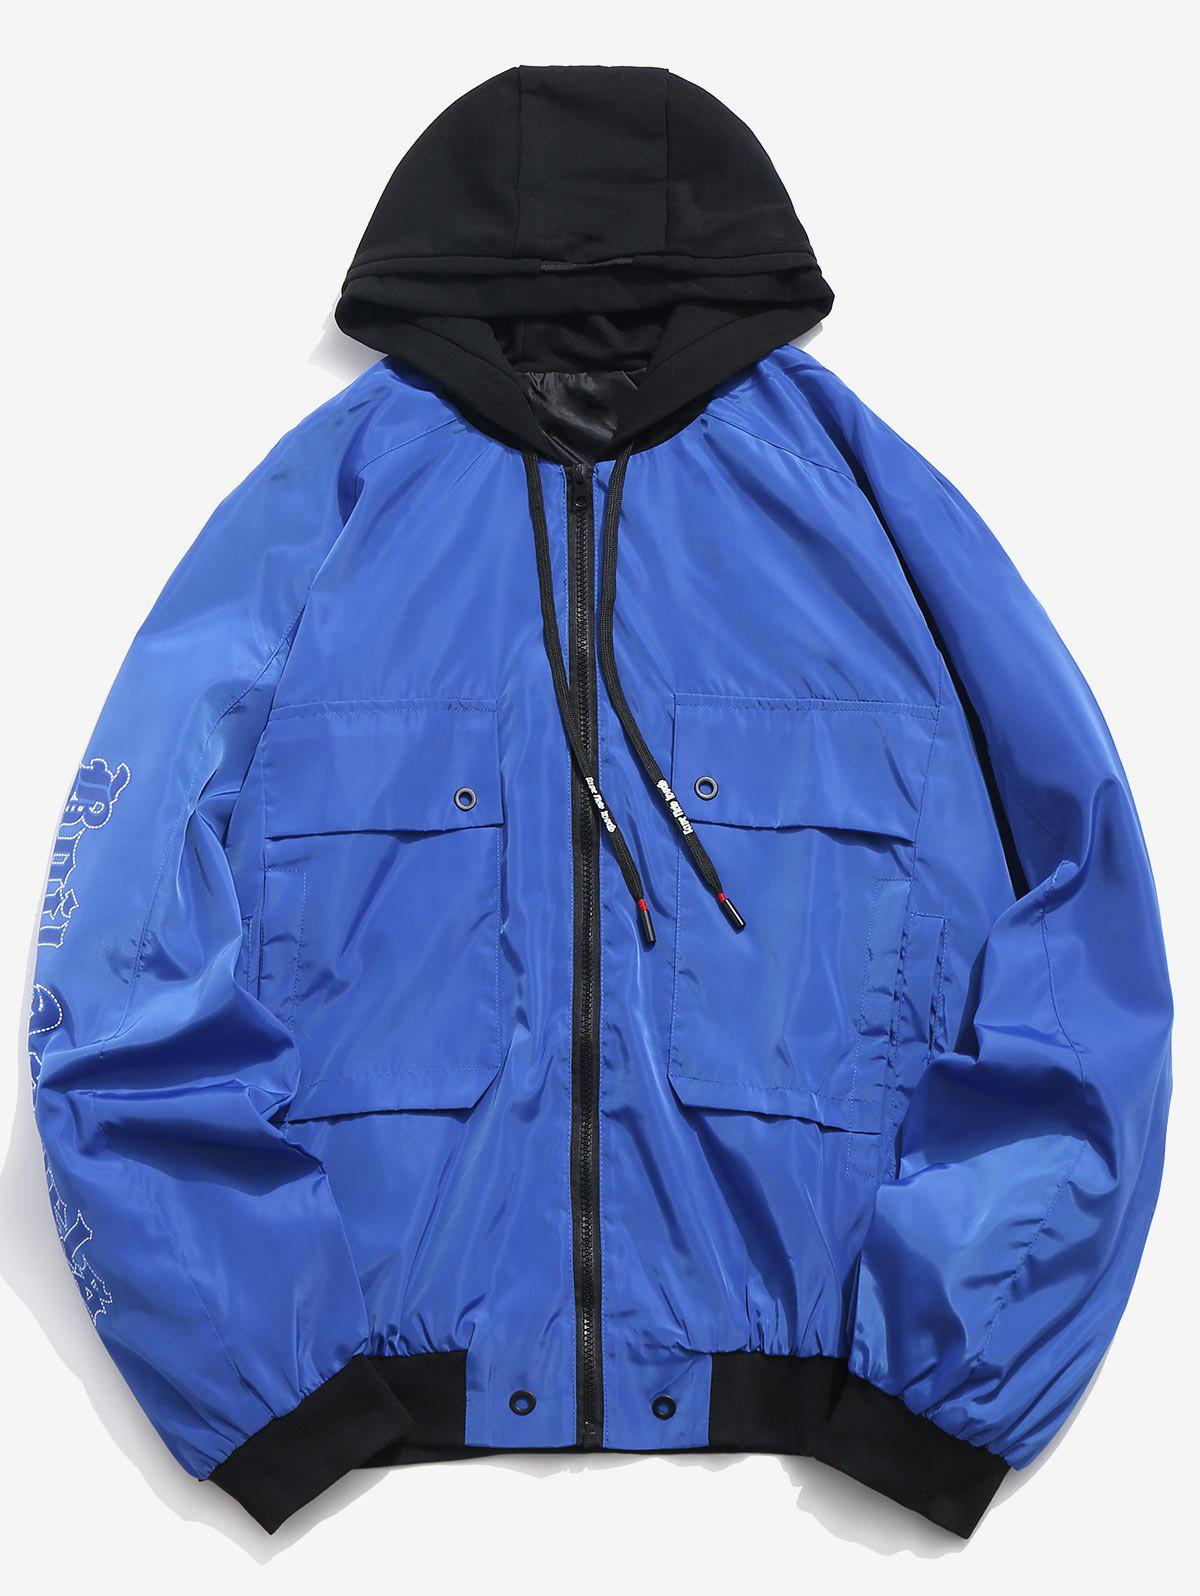 Letter Print Hooded Windproof Jacket